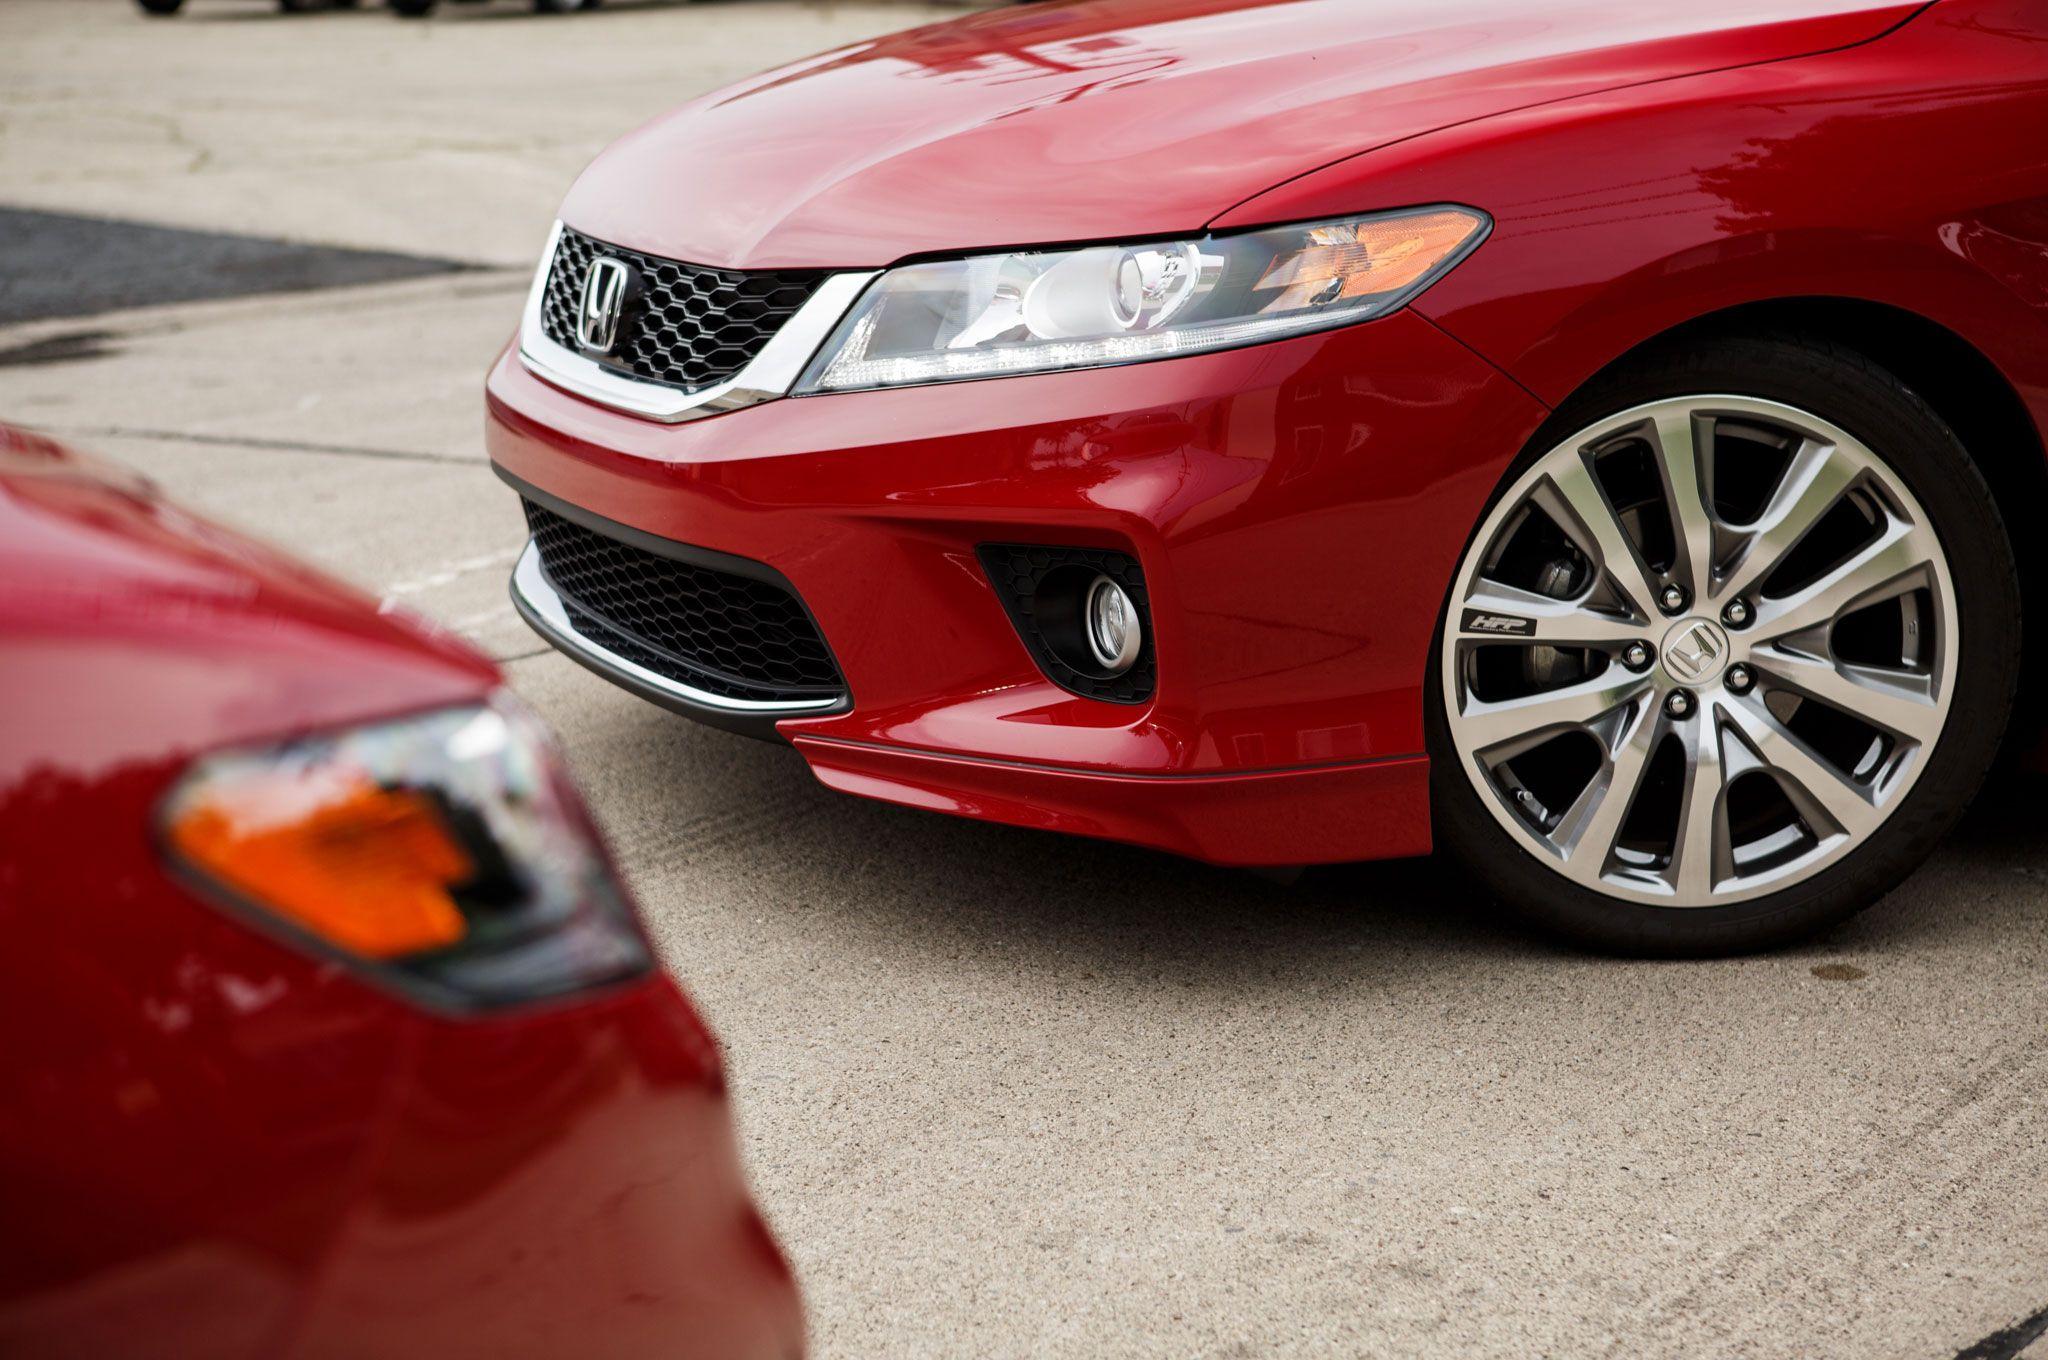 Accord coupe red sport 2011 buscar con google